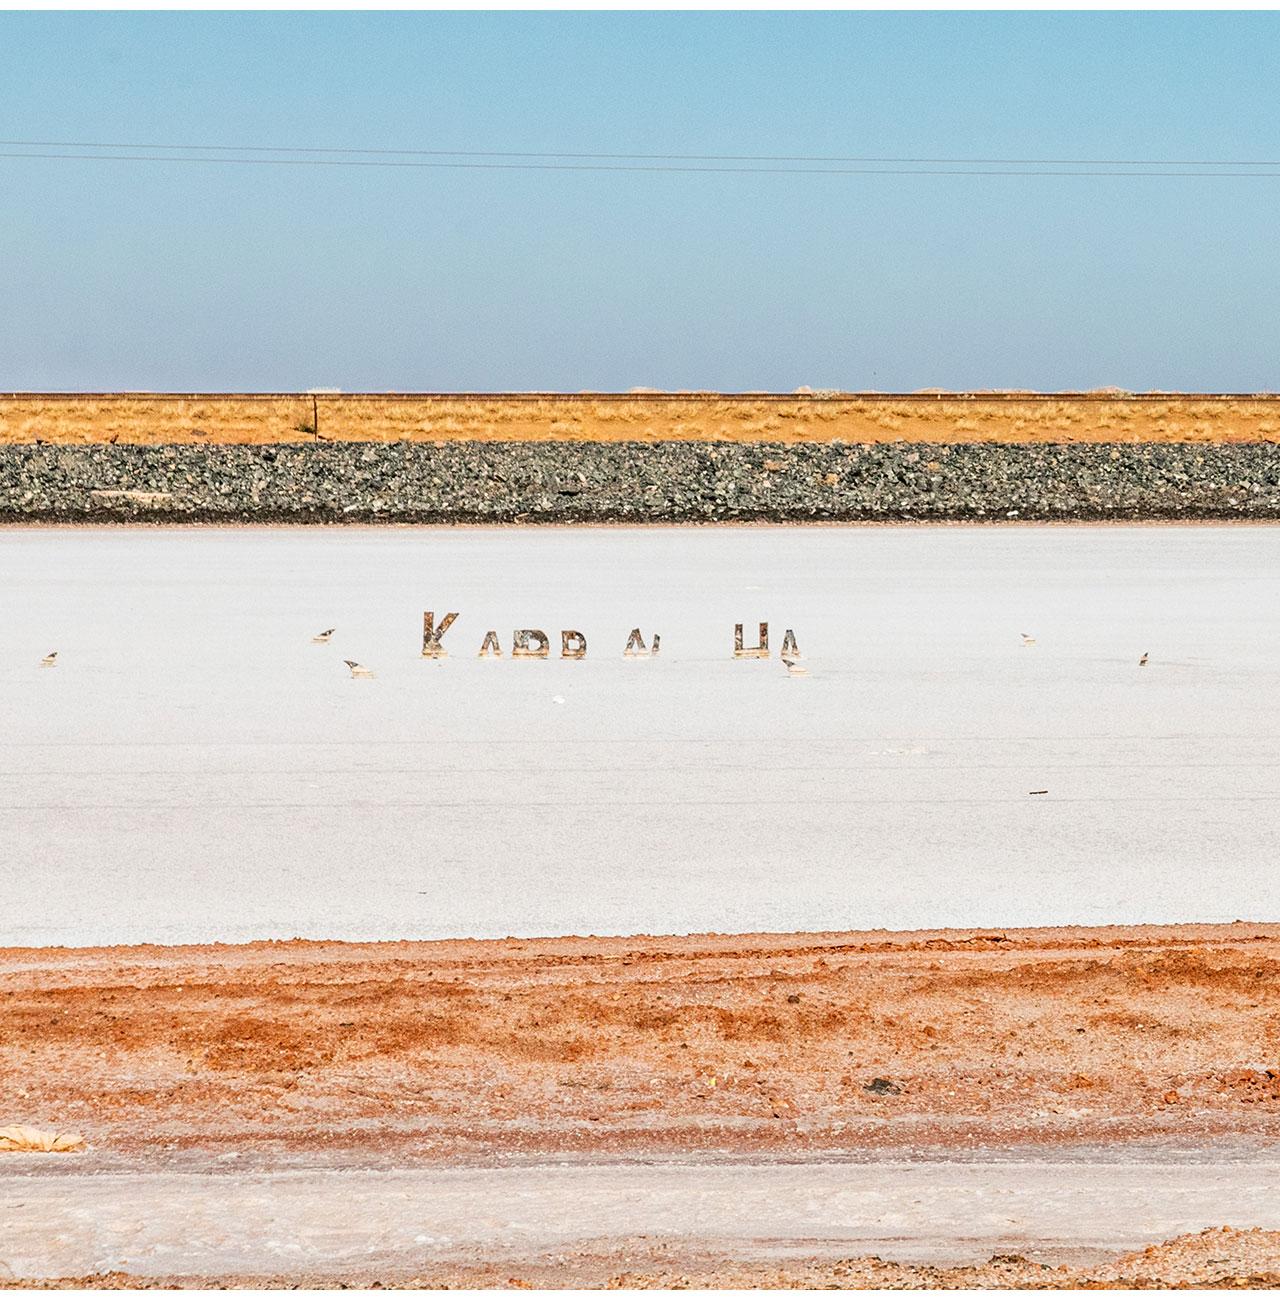 Horizontal lines of the railway track and salt flats near Karratha in the Pilbara region of Western Australia